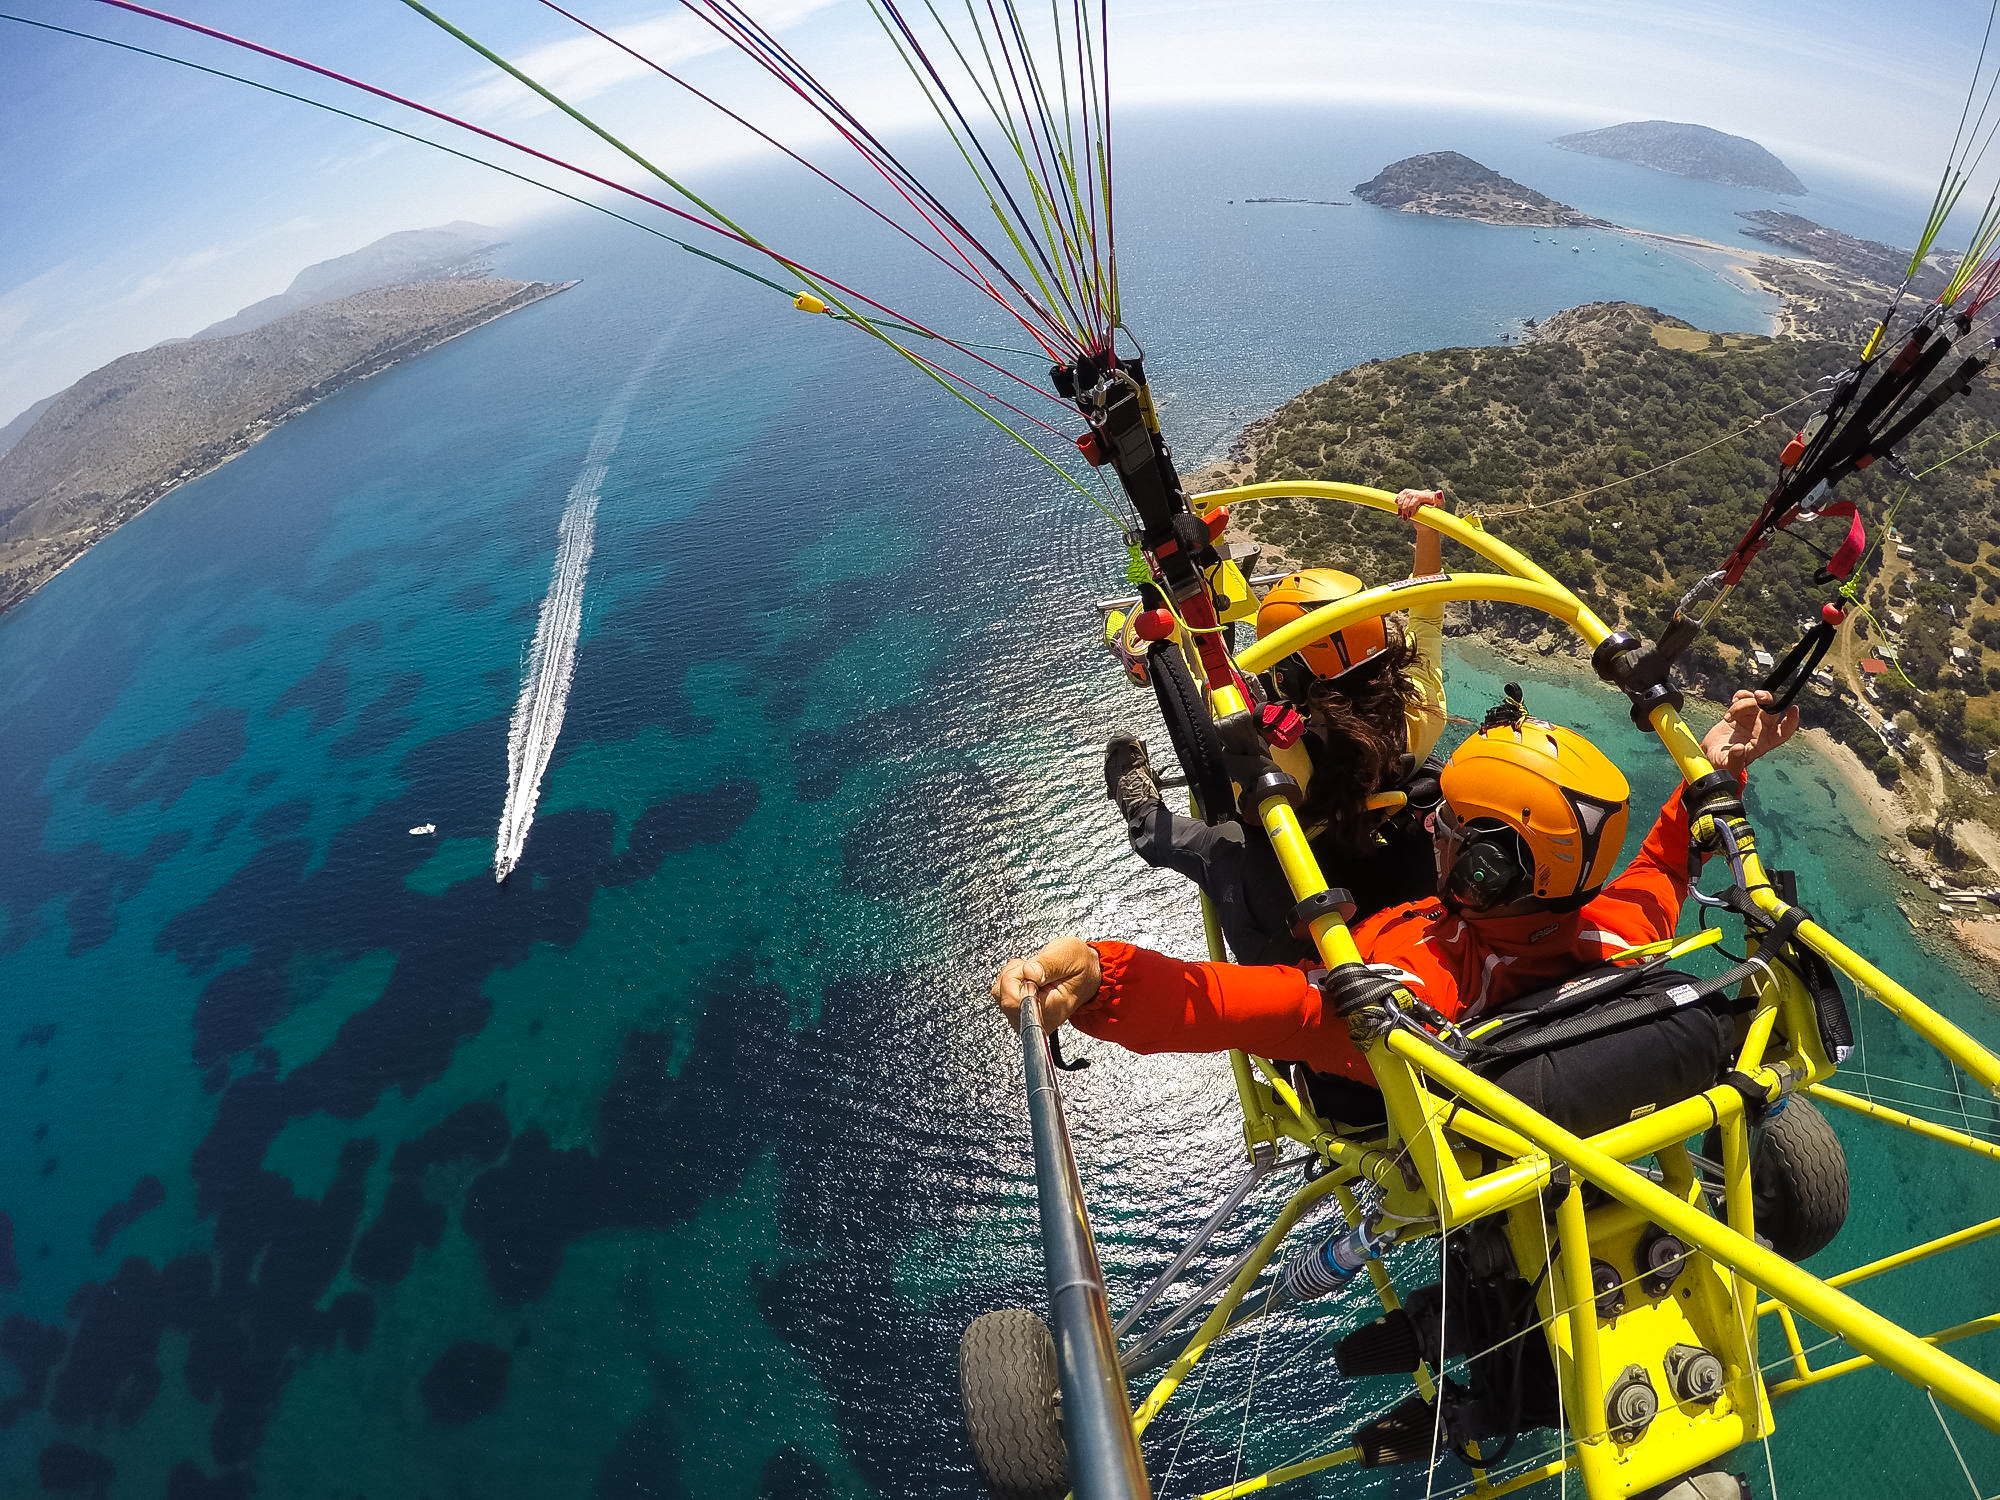 Super Διαγωνισμός! Μια Δωρεάν πτήση μοναδικής εμπειρίας με μηχανοκίνητο αλεξίπτωτου πλαγιάς (para-trike)! (Updated – Winner)